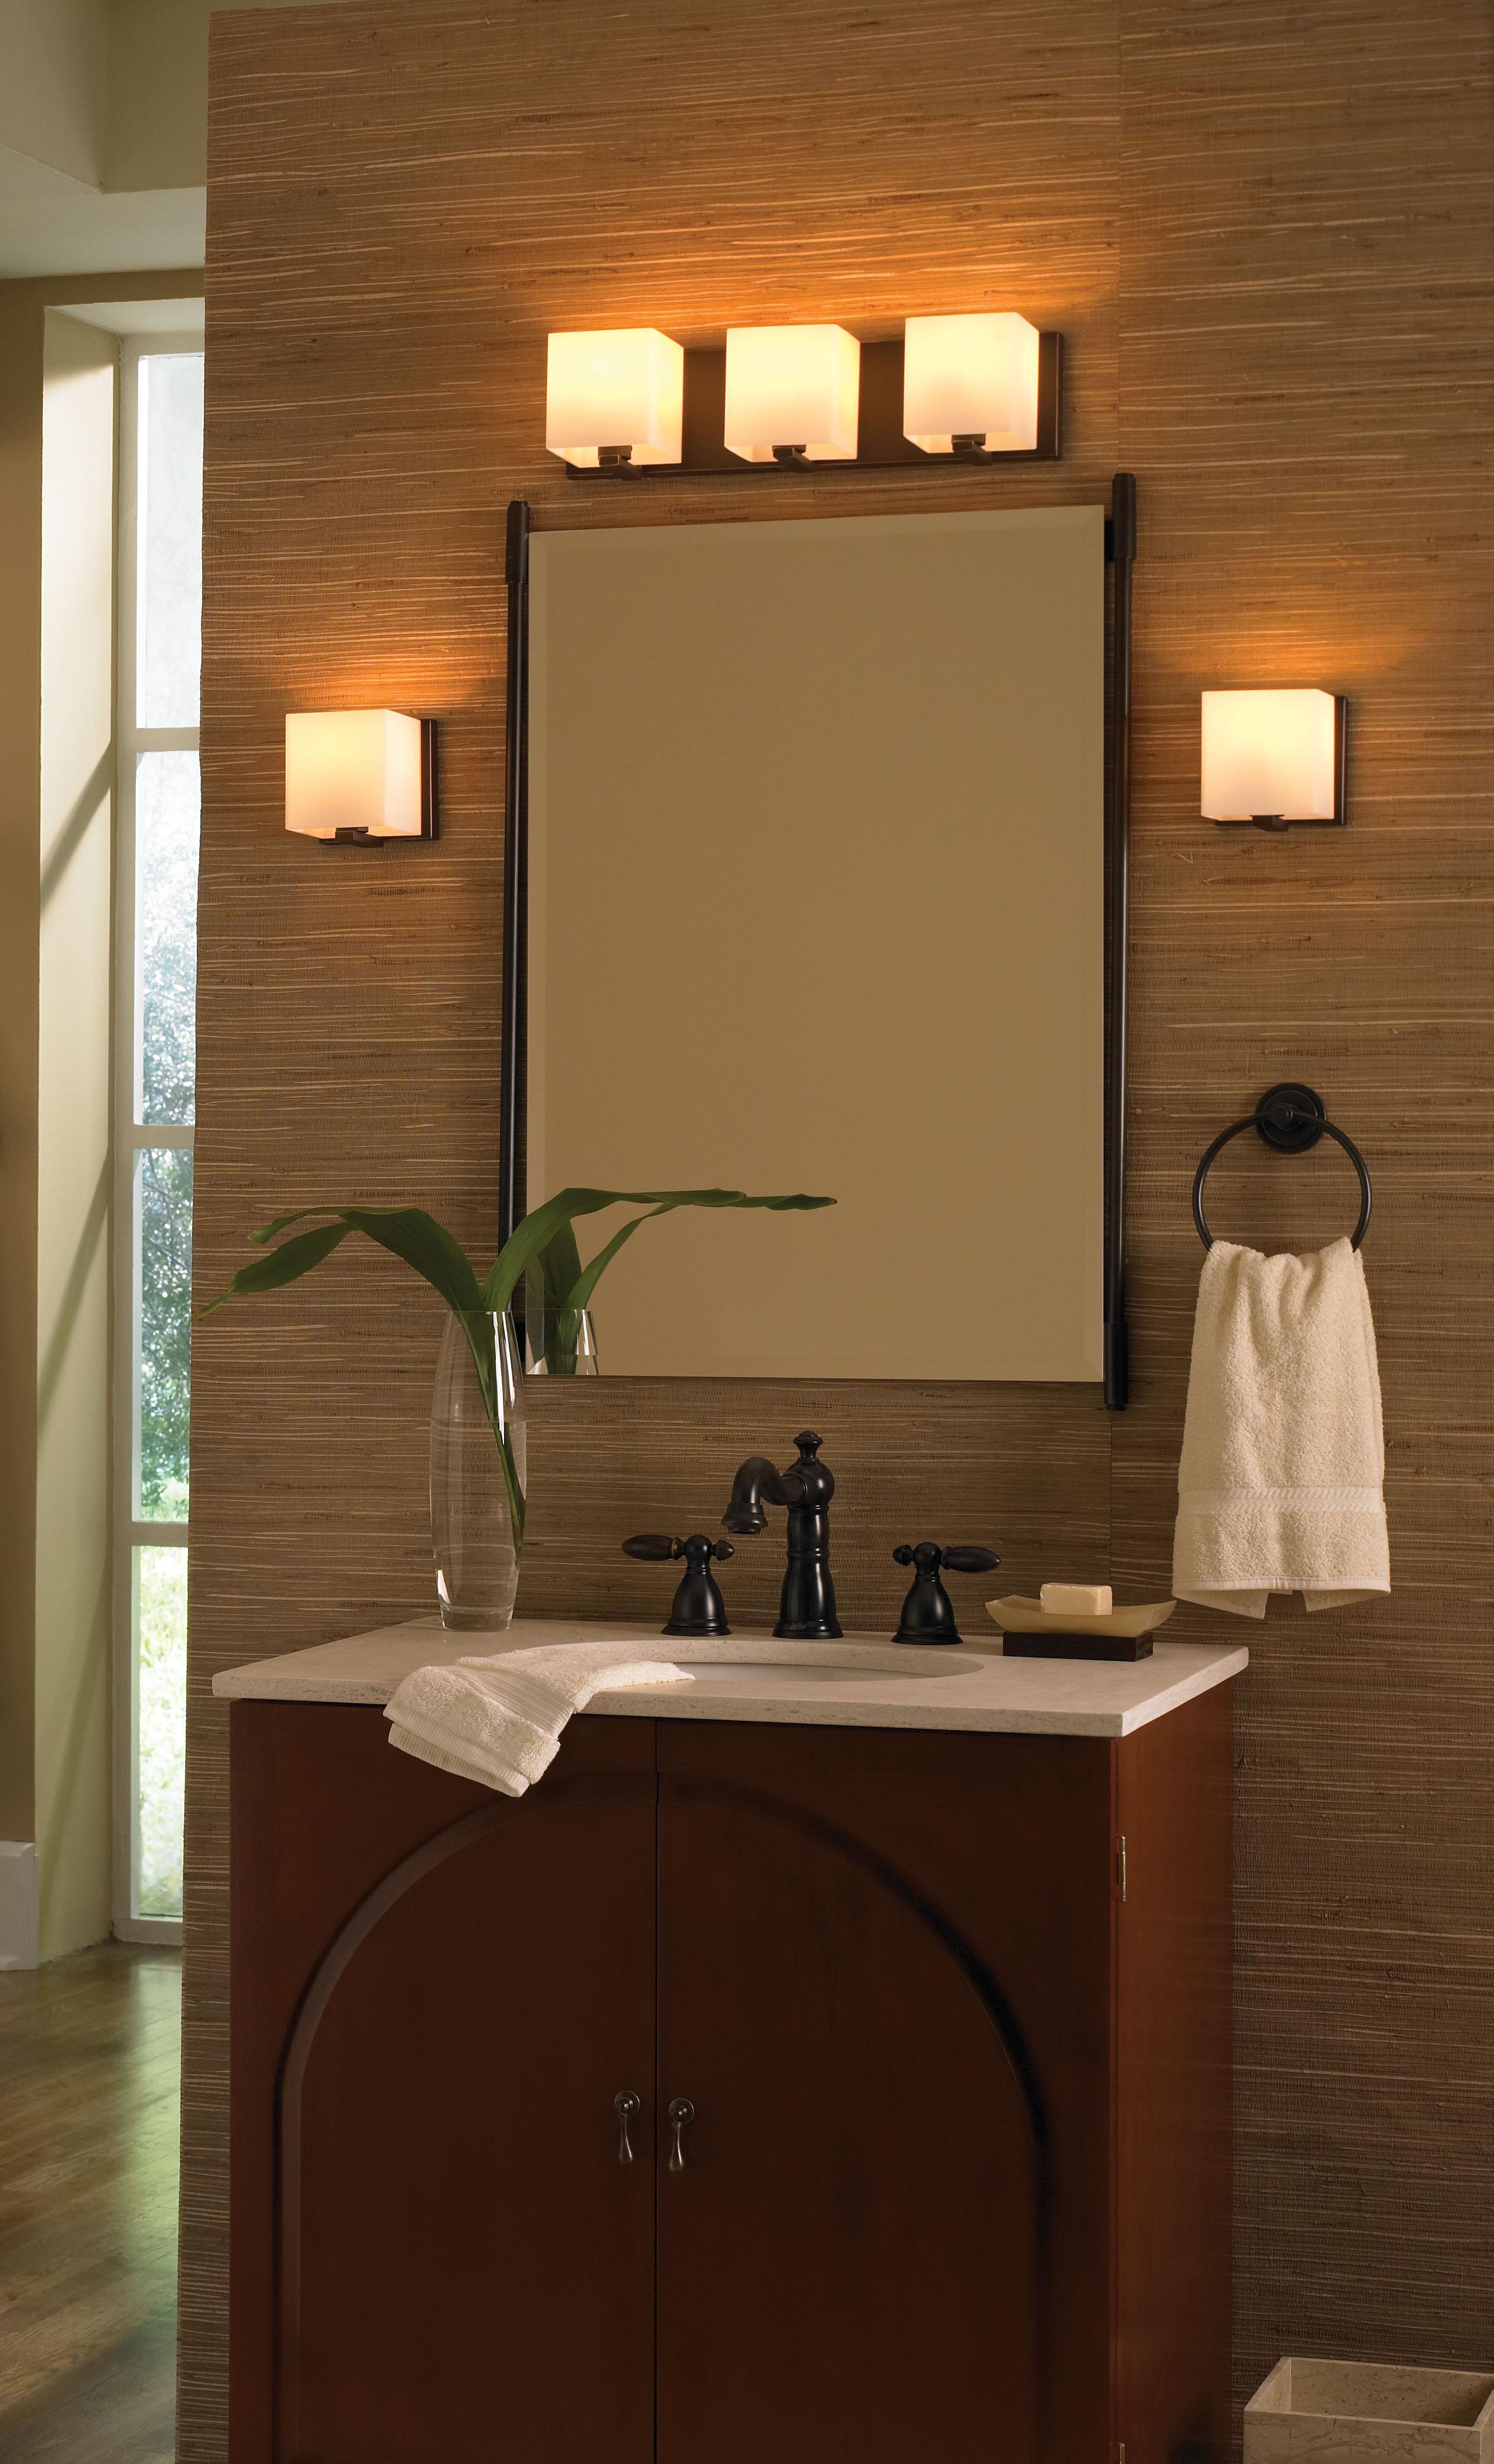 Lumenscom Highlights Favorites for Modern Bath Lighting